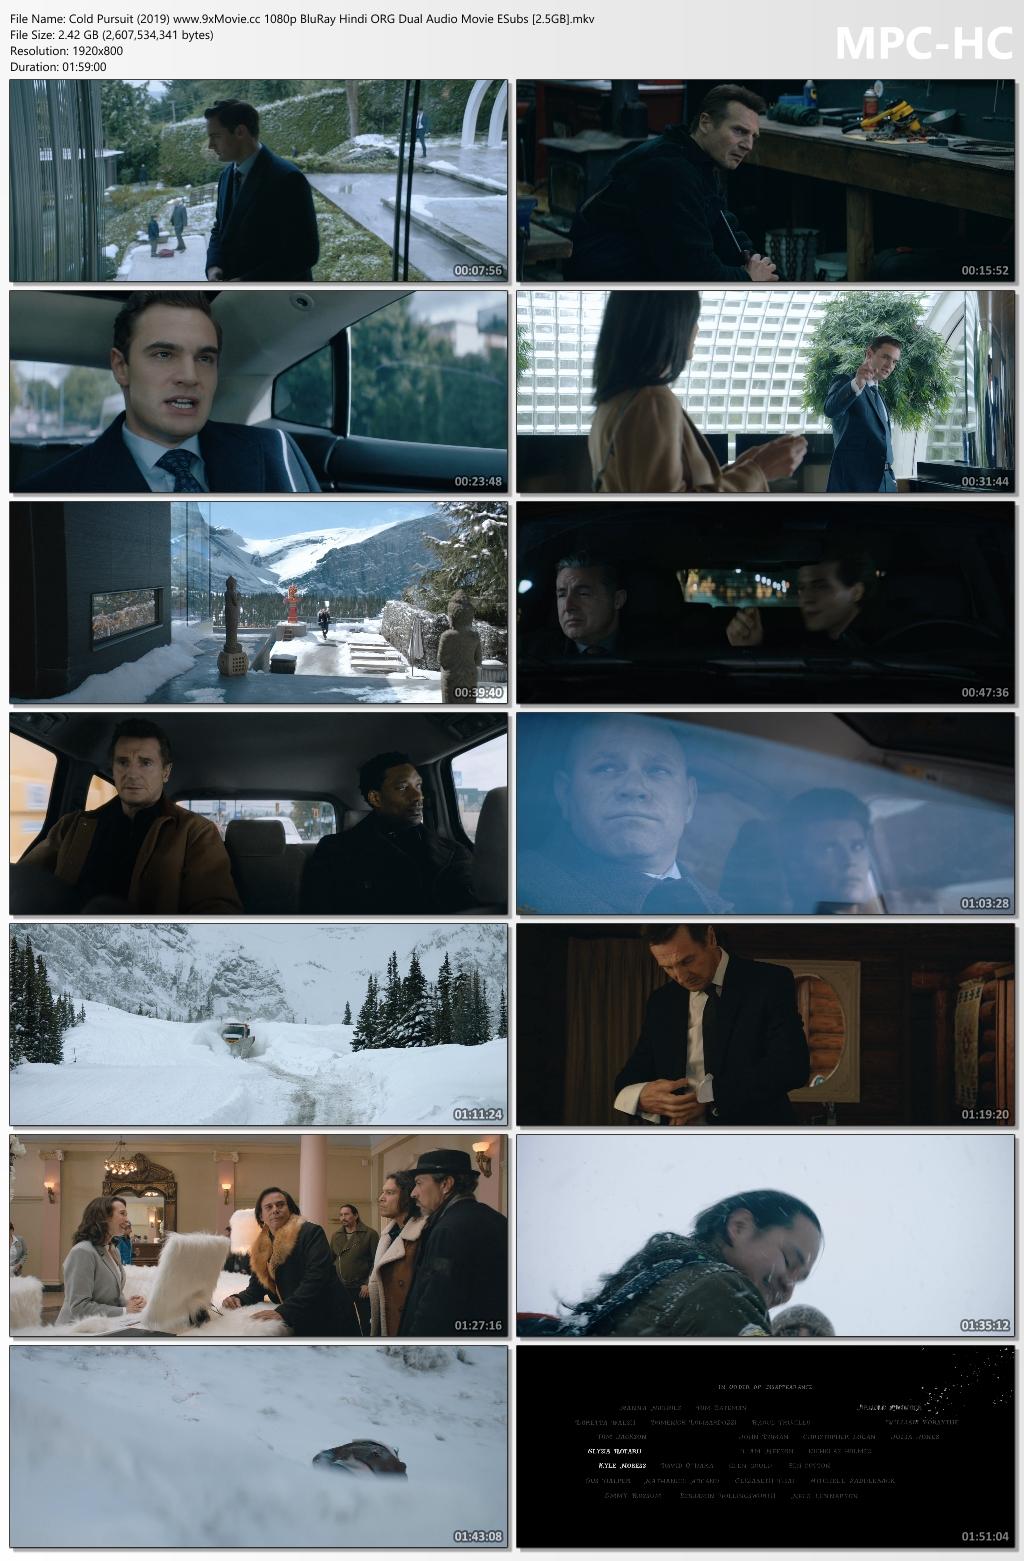 Cold-Pursuit-2019-www-9x-Movie-cc-1080p-Blu-Ray-Hindi-ORG-Dual-Audio-Movie-ESubs-2-5-GB-mkv